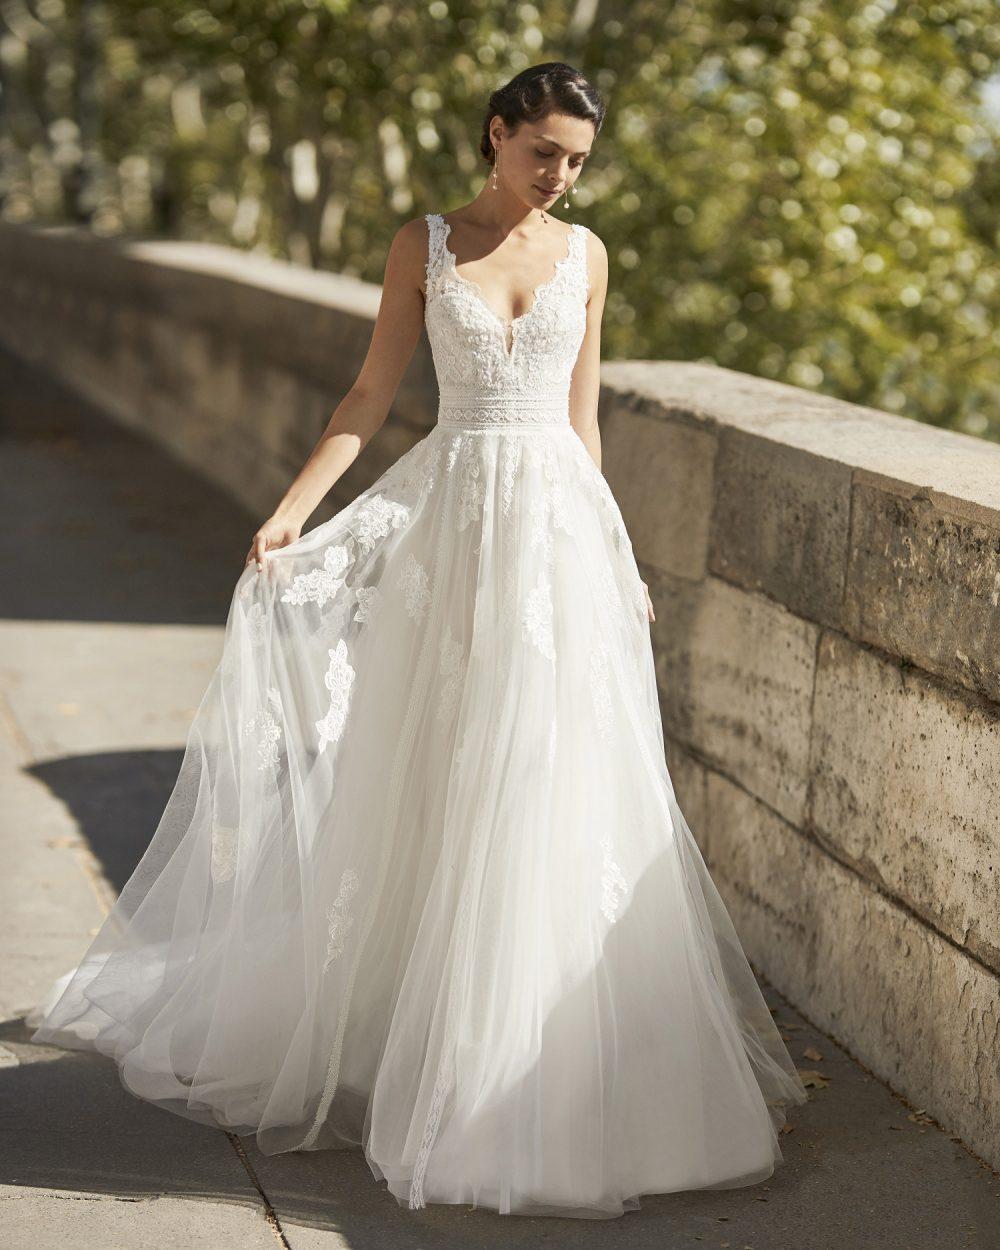 Mariages: abito da sposa Rosa Clarà 2021 a Vicenza, Verona, Padova, Veneto 5B155 WYATT